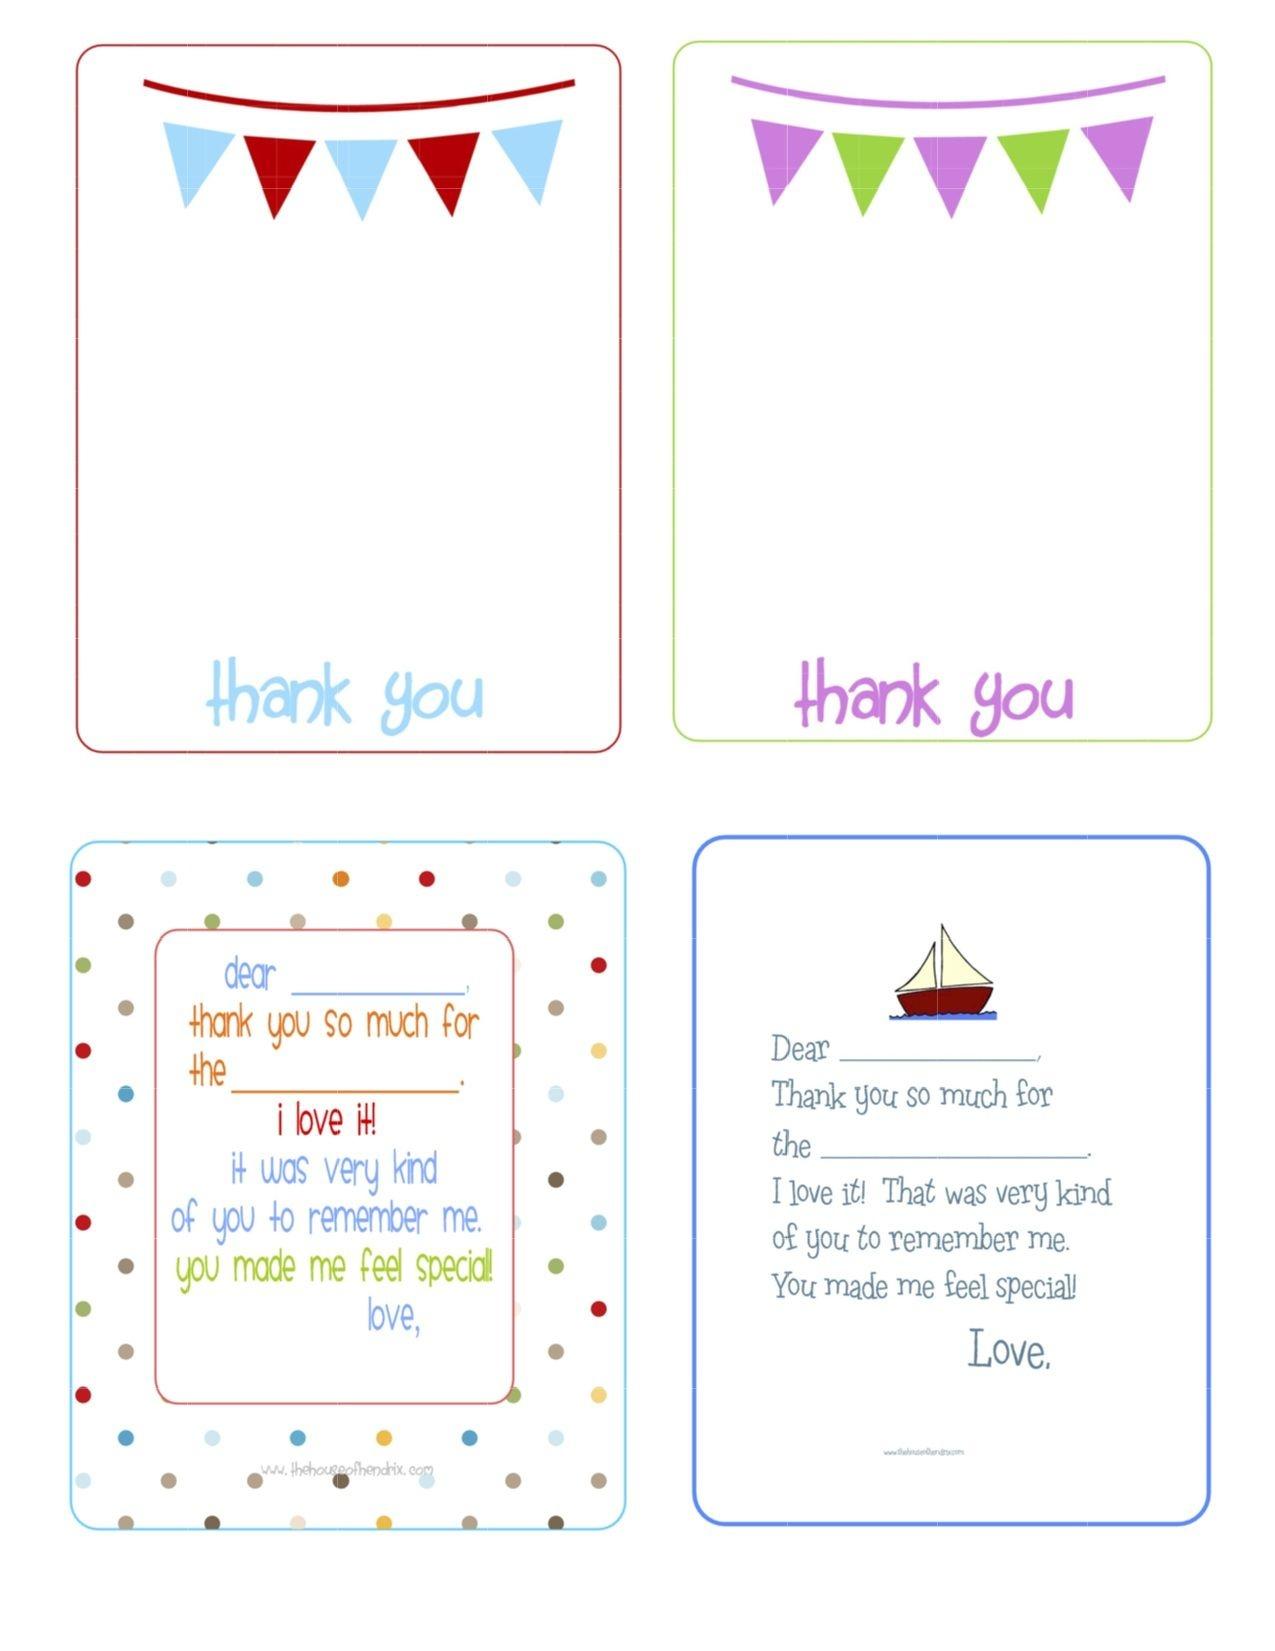 Printable Birthday Thank You Cards -   Printables & Fonts - Free Printable Thank You Cards For Soldiers